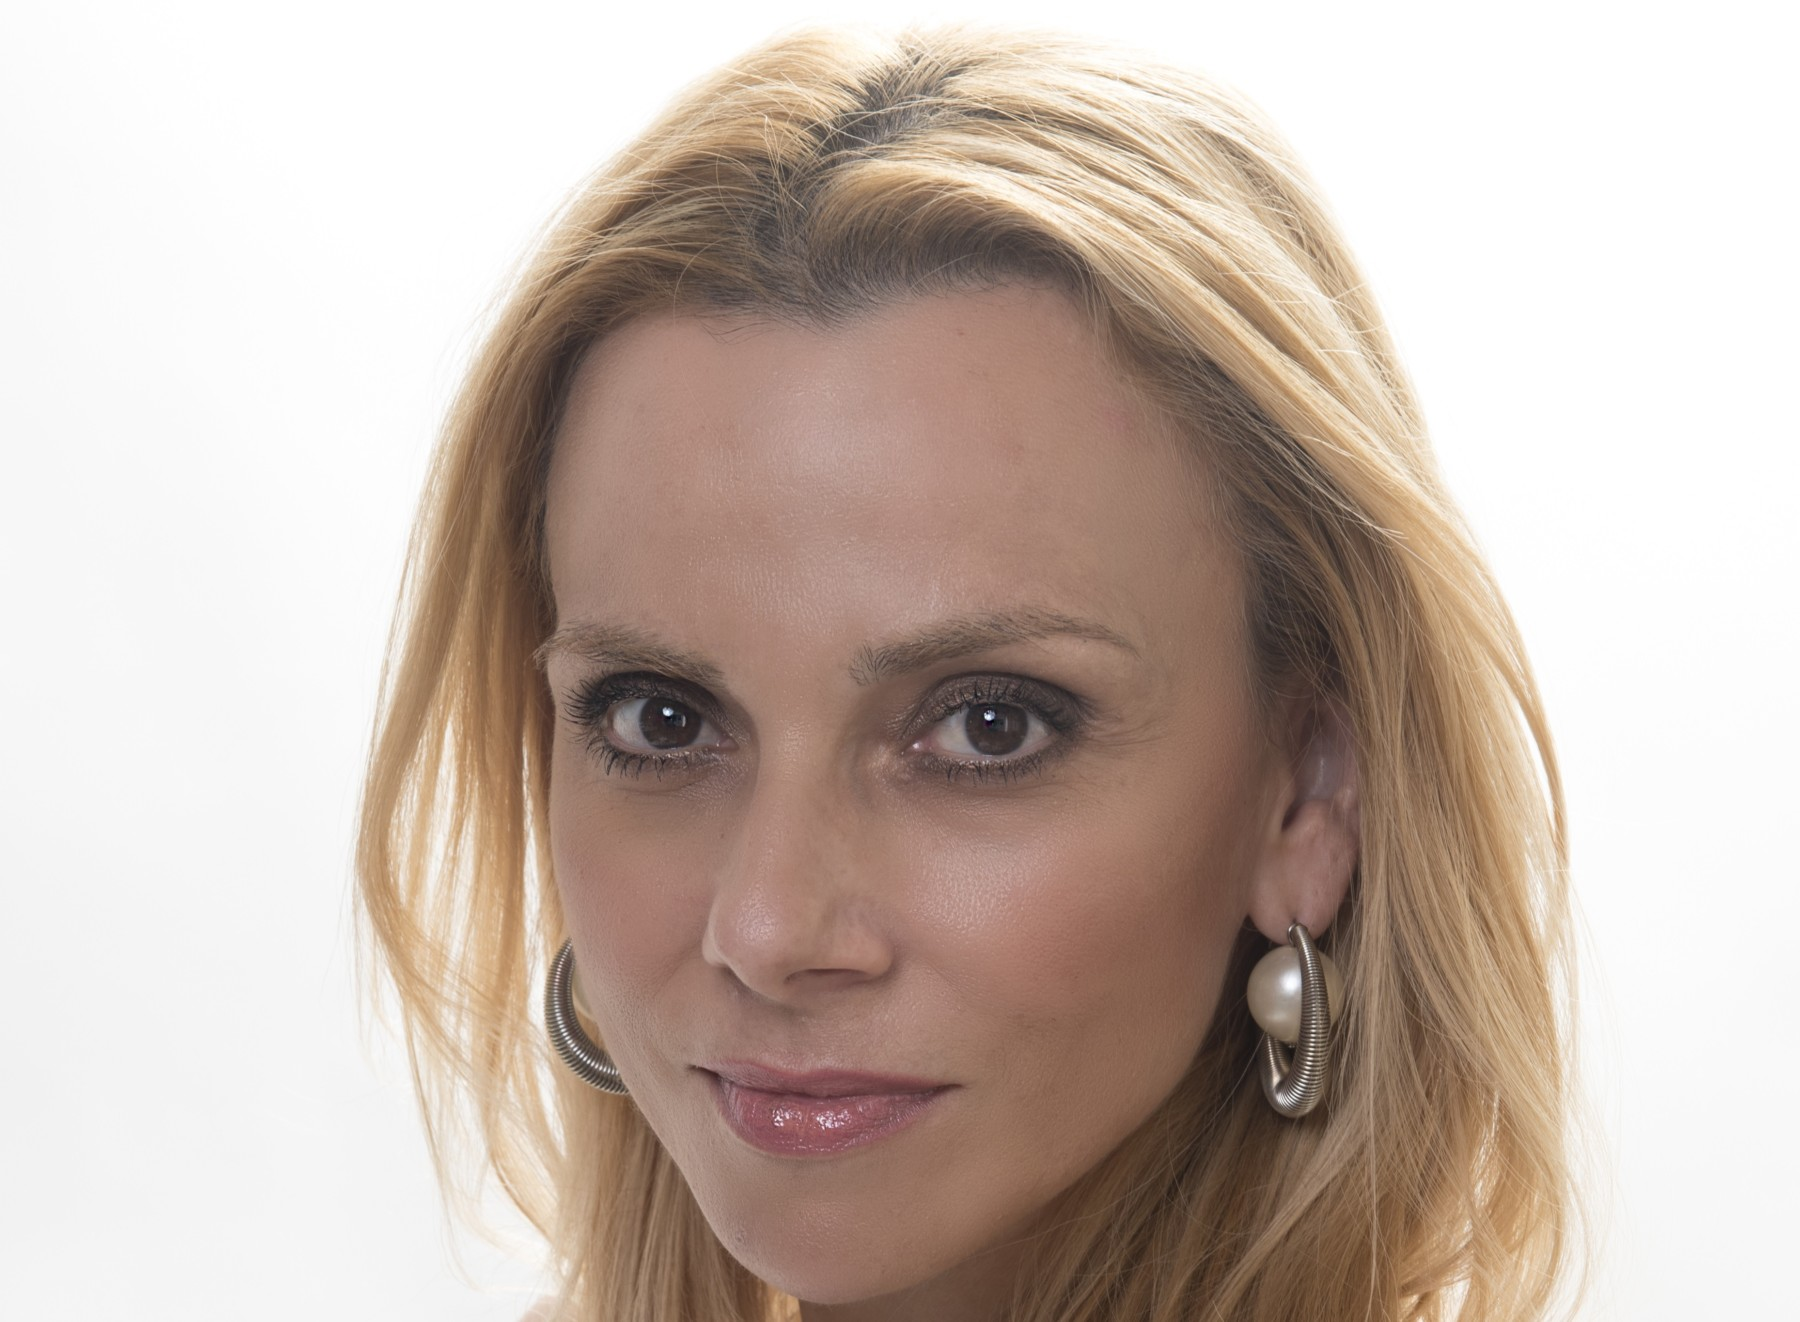 H κα Ελένη Ματράκη είναι δικηγόρος και Life, Wellness & Business Coach. Φωτ. Κατερίνα Λιάπτσιου